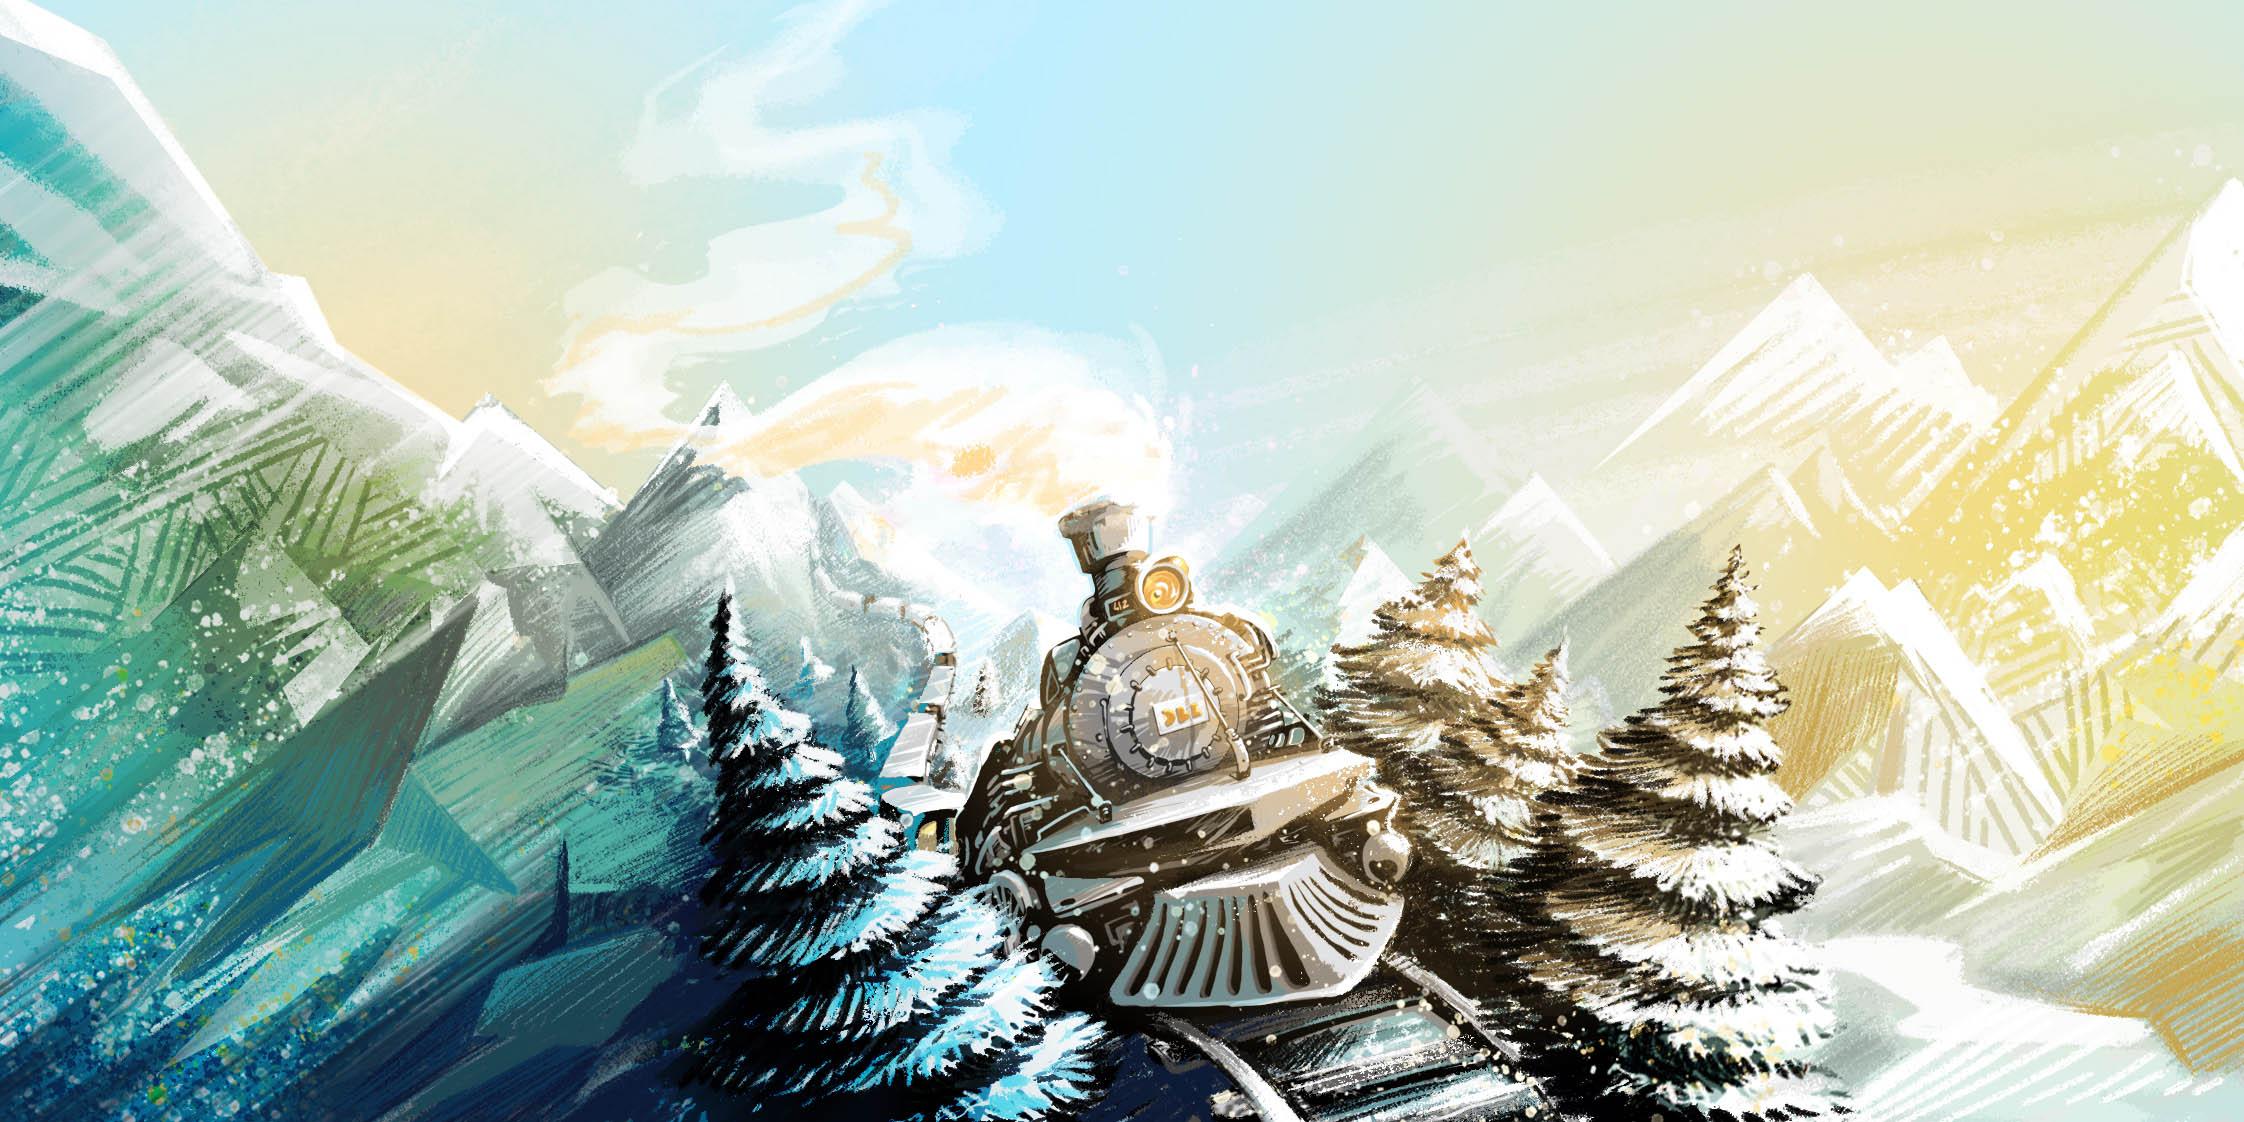 snowpiercer-train-locomotive-steam--abys-beer - biere blanche - tranperseneige-illustration